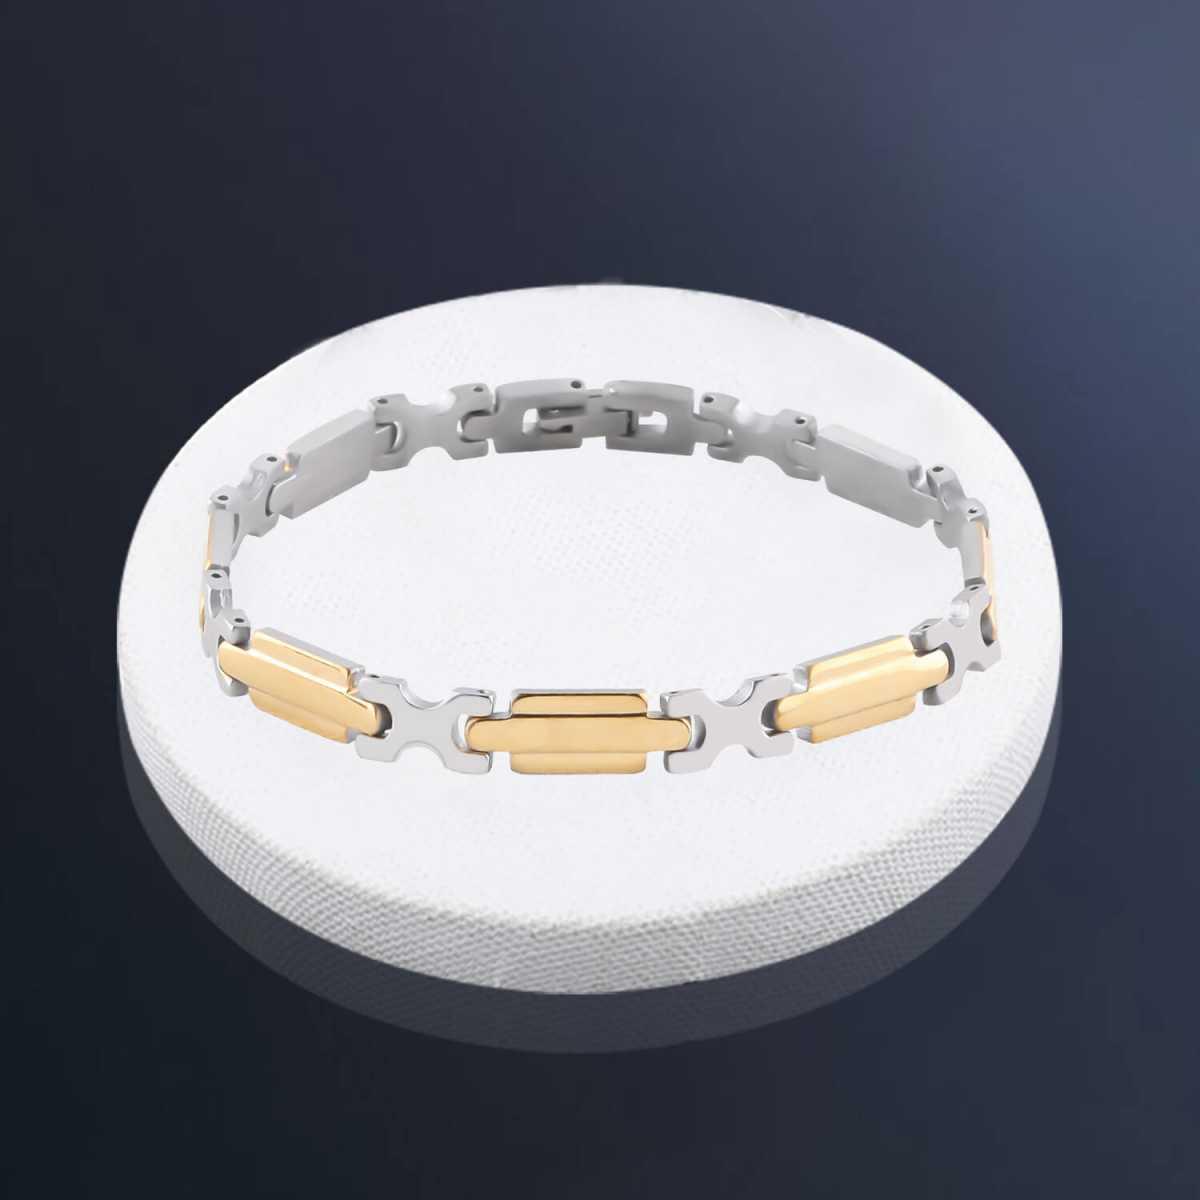 Adorable slim Designer Bracelet for men Jewellery